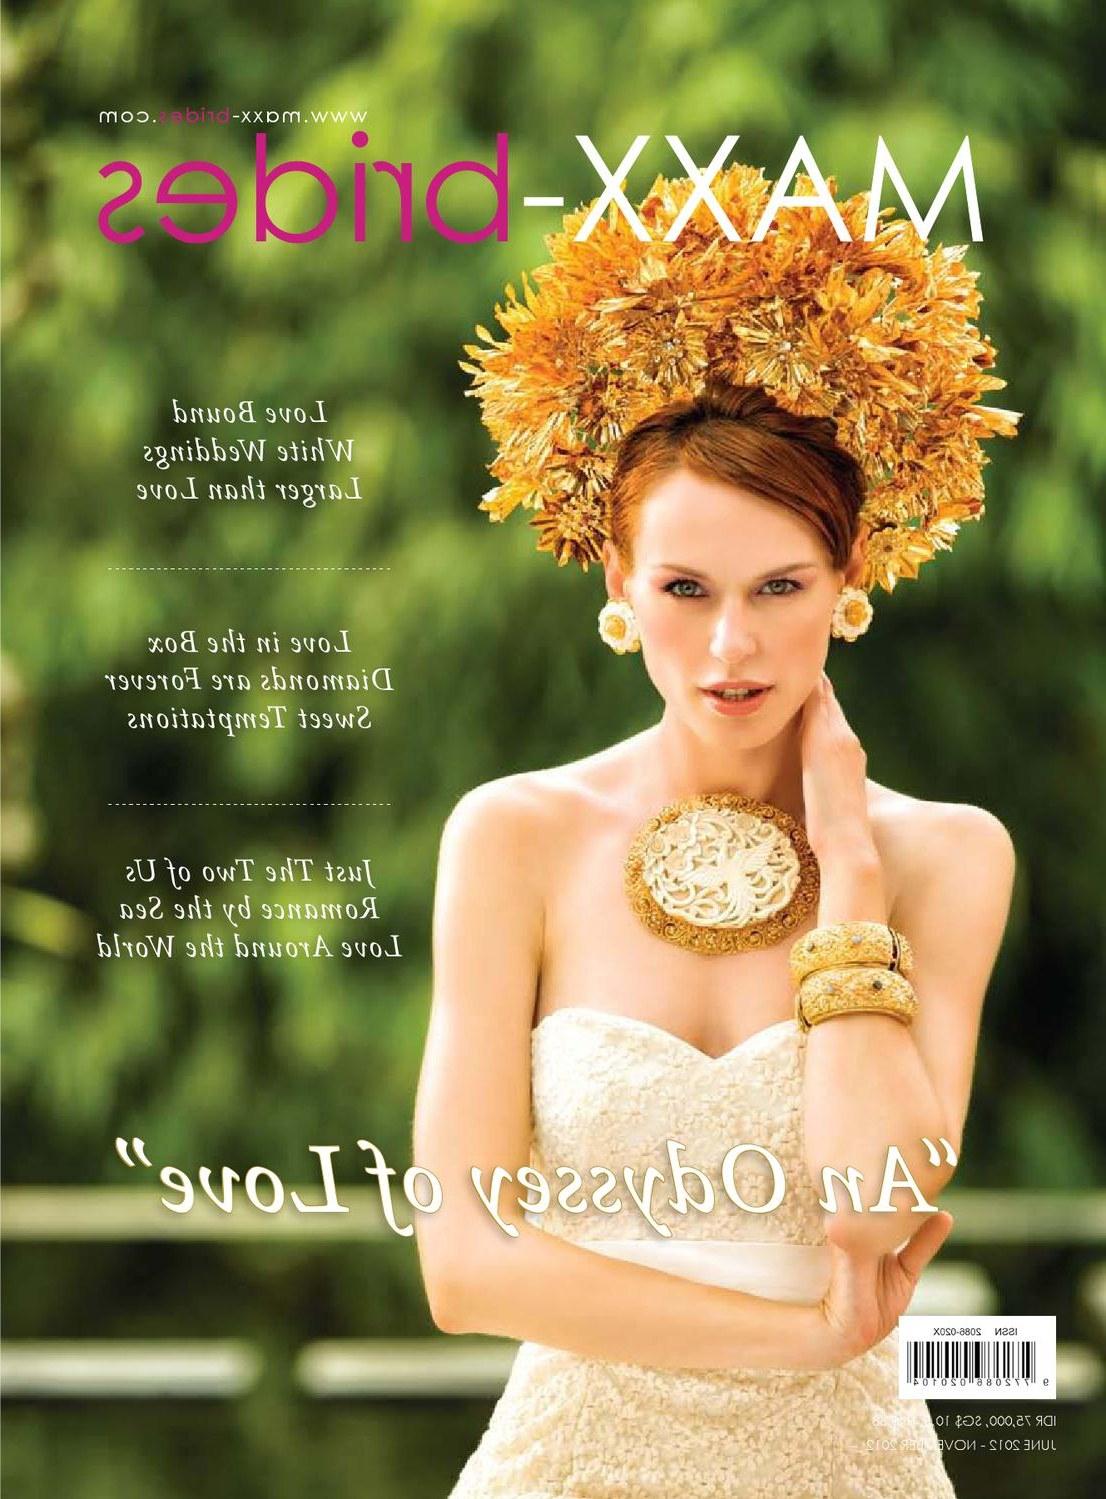 Inspirasi Model Kebaya Bridesmaid Hijab 3id6 Maxx Brides Juni November Wedding Magazine by Dika Rachman